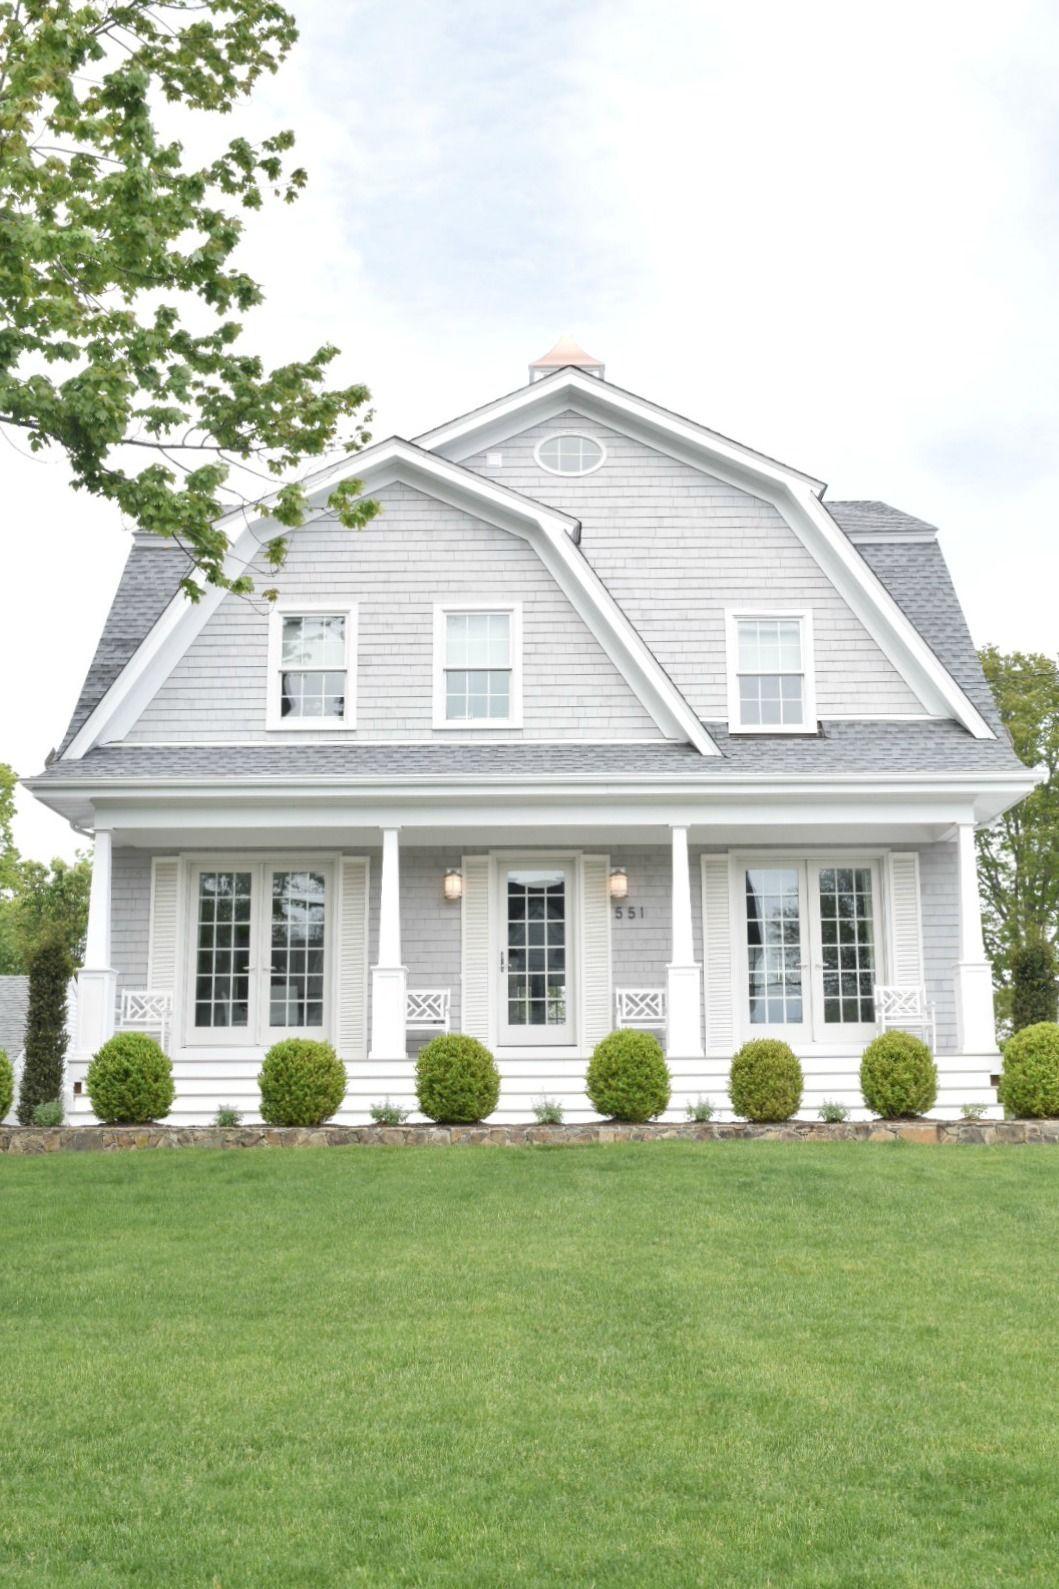 New England Homes- Exterior Paint Color Ideas | Exterior paint ...